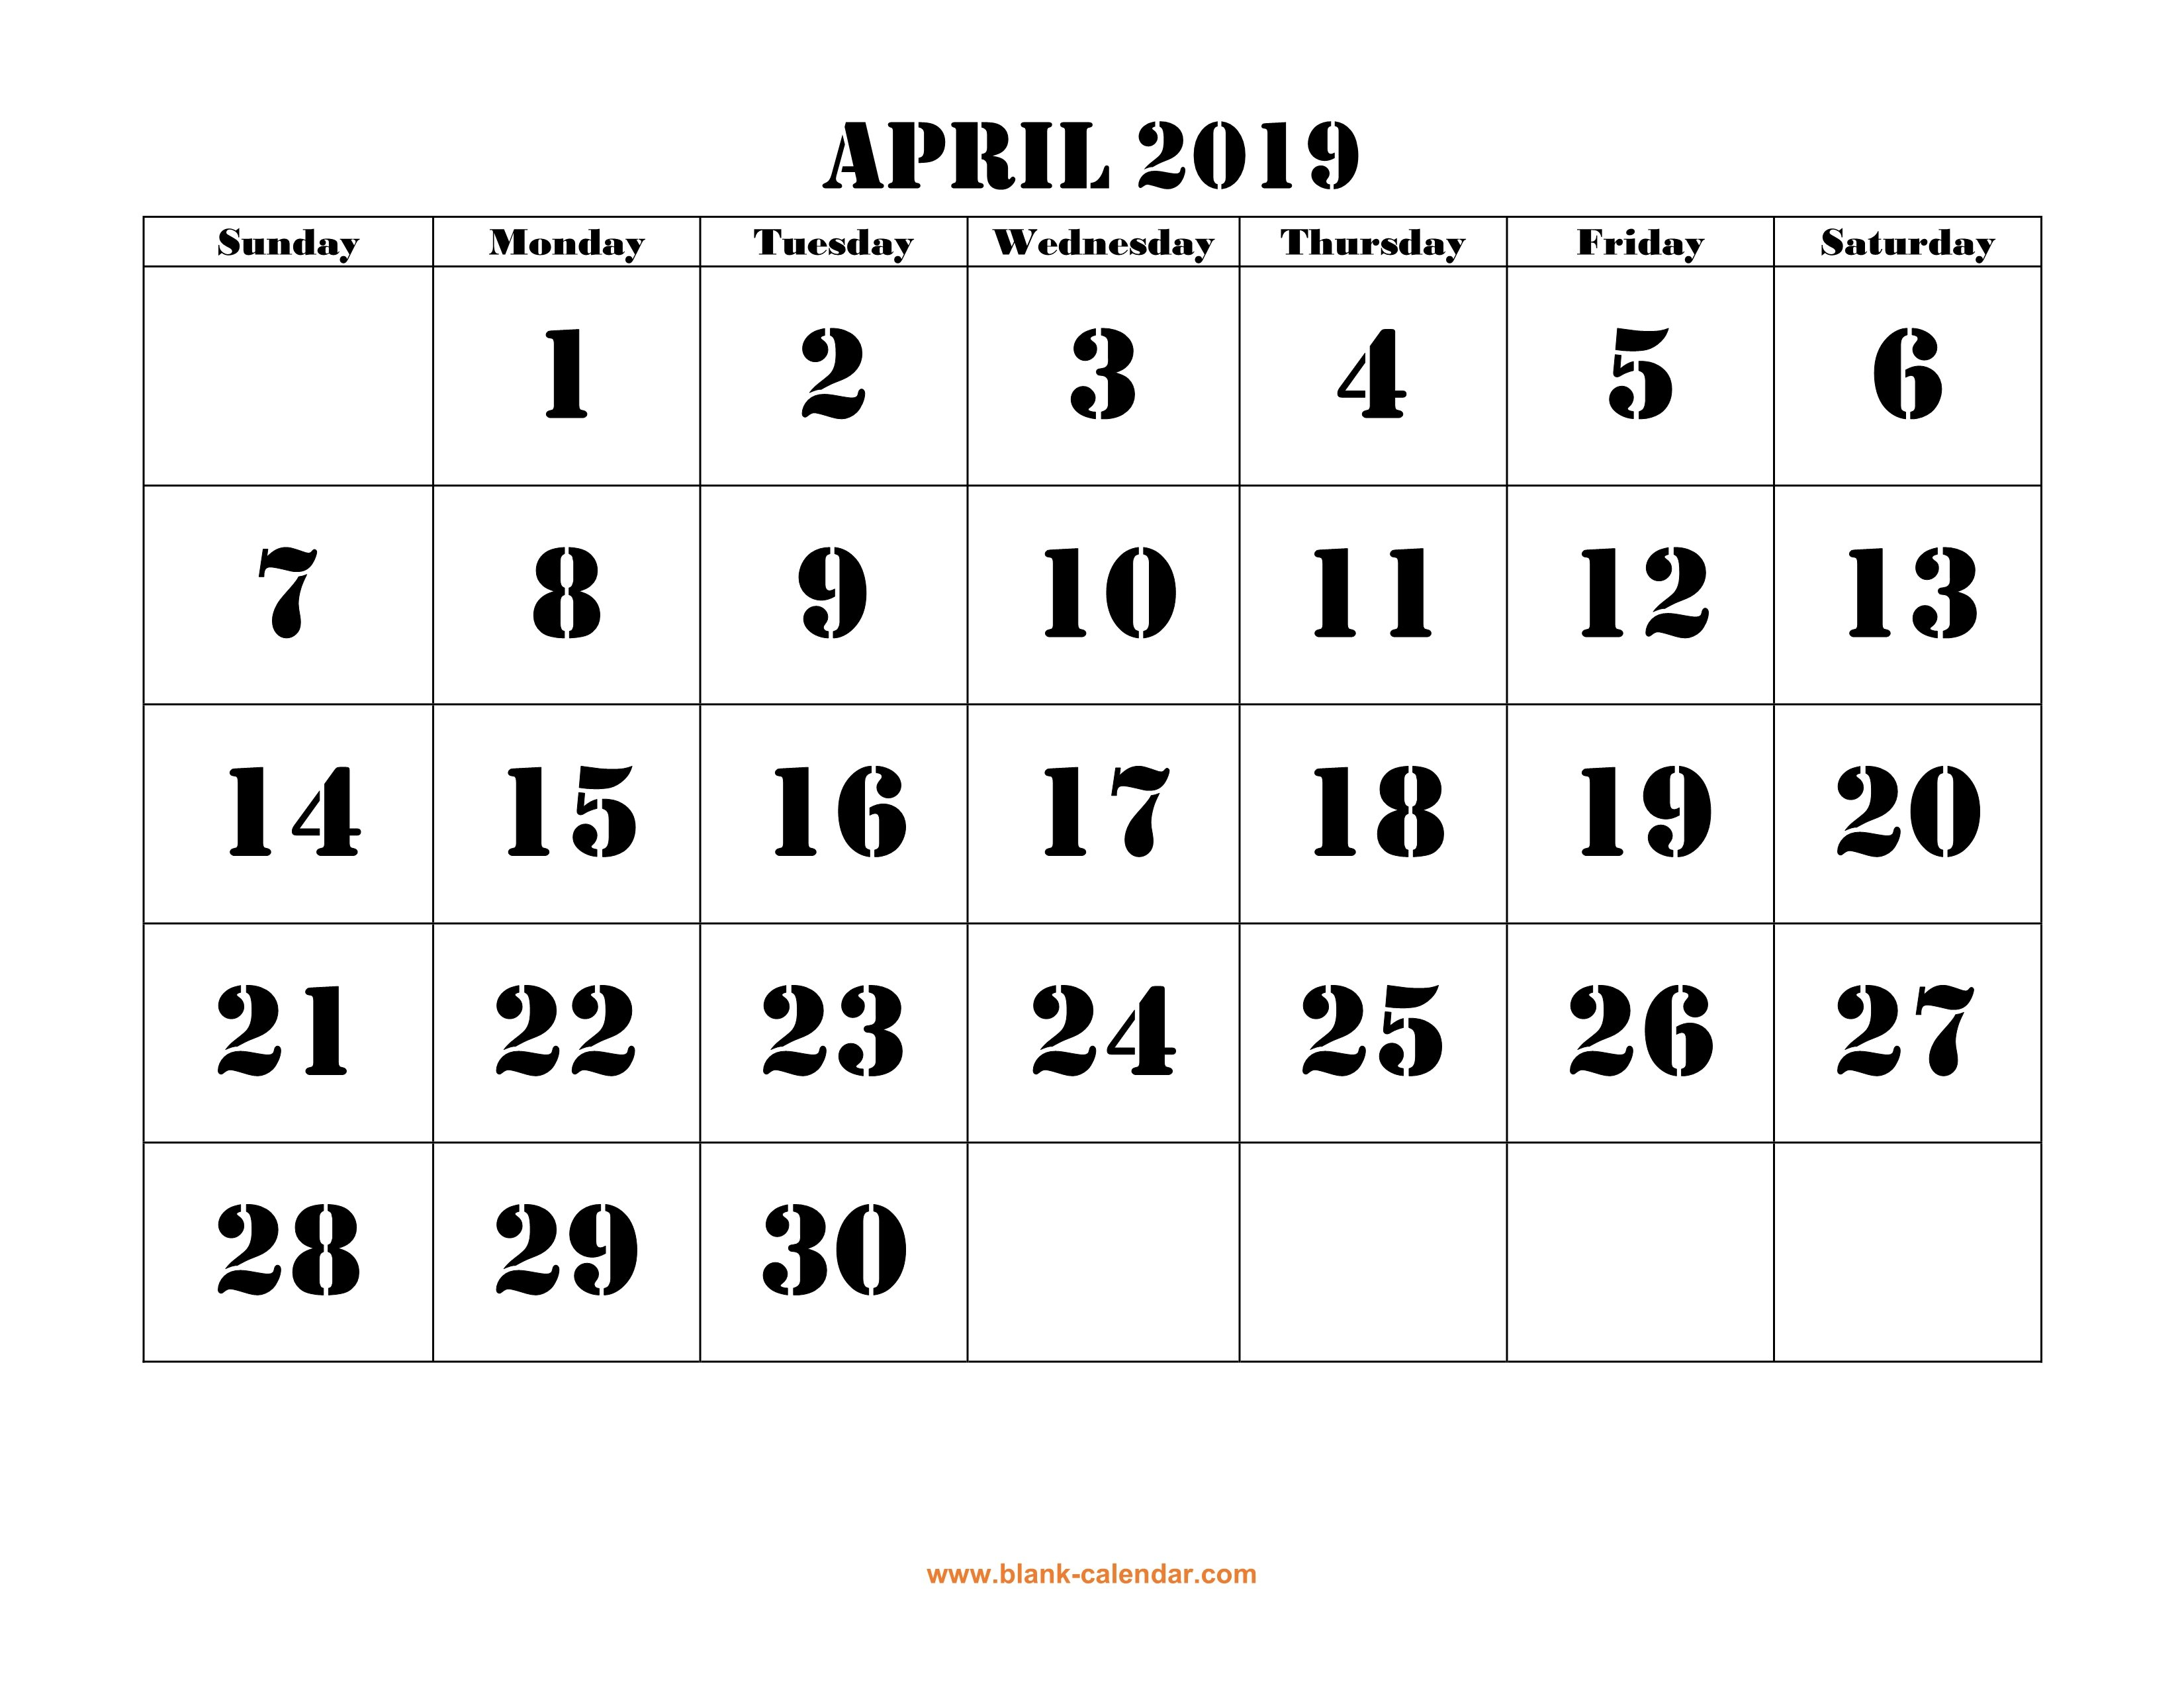 Free Download Printable April 2019 Calendar, Large Font Design April 5 2019 Calendar